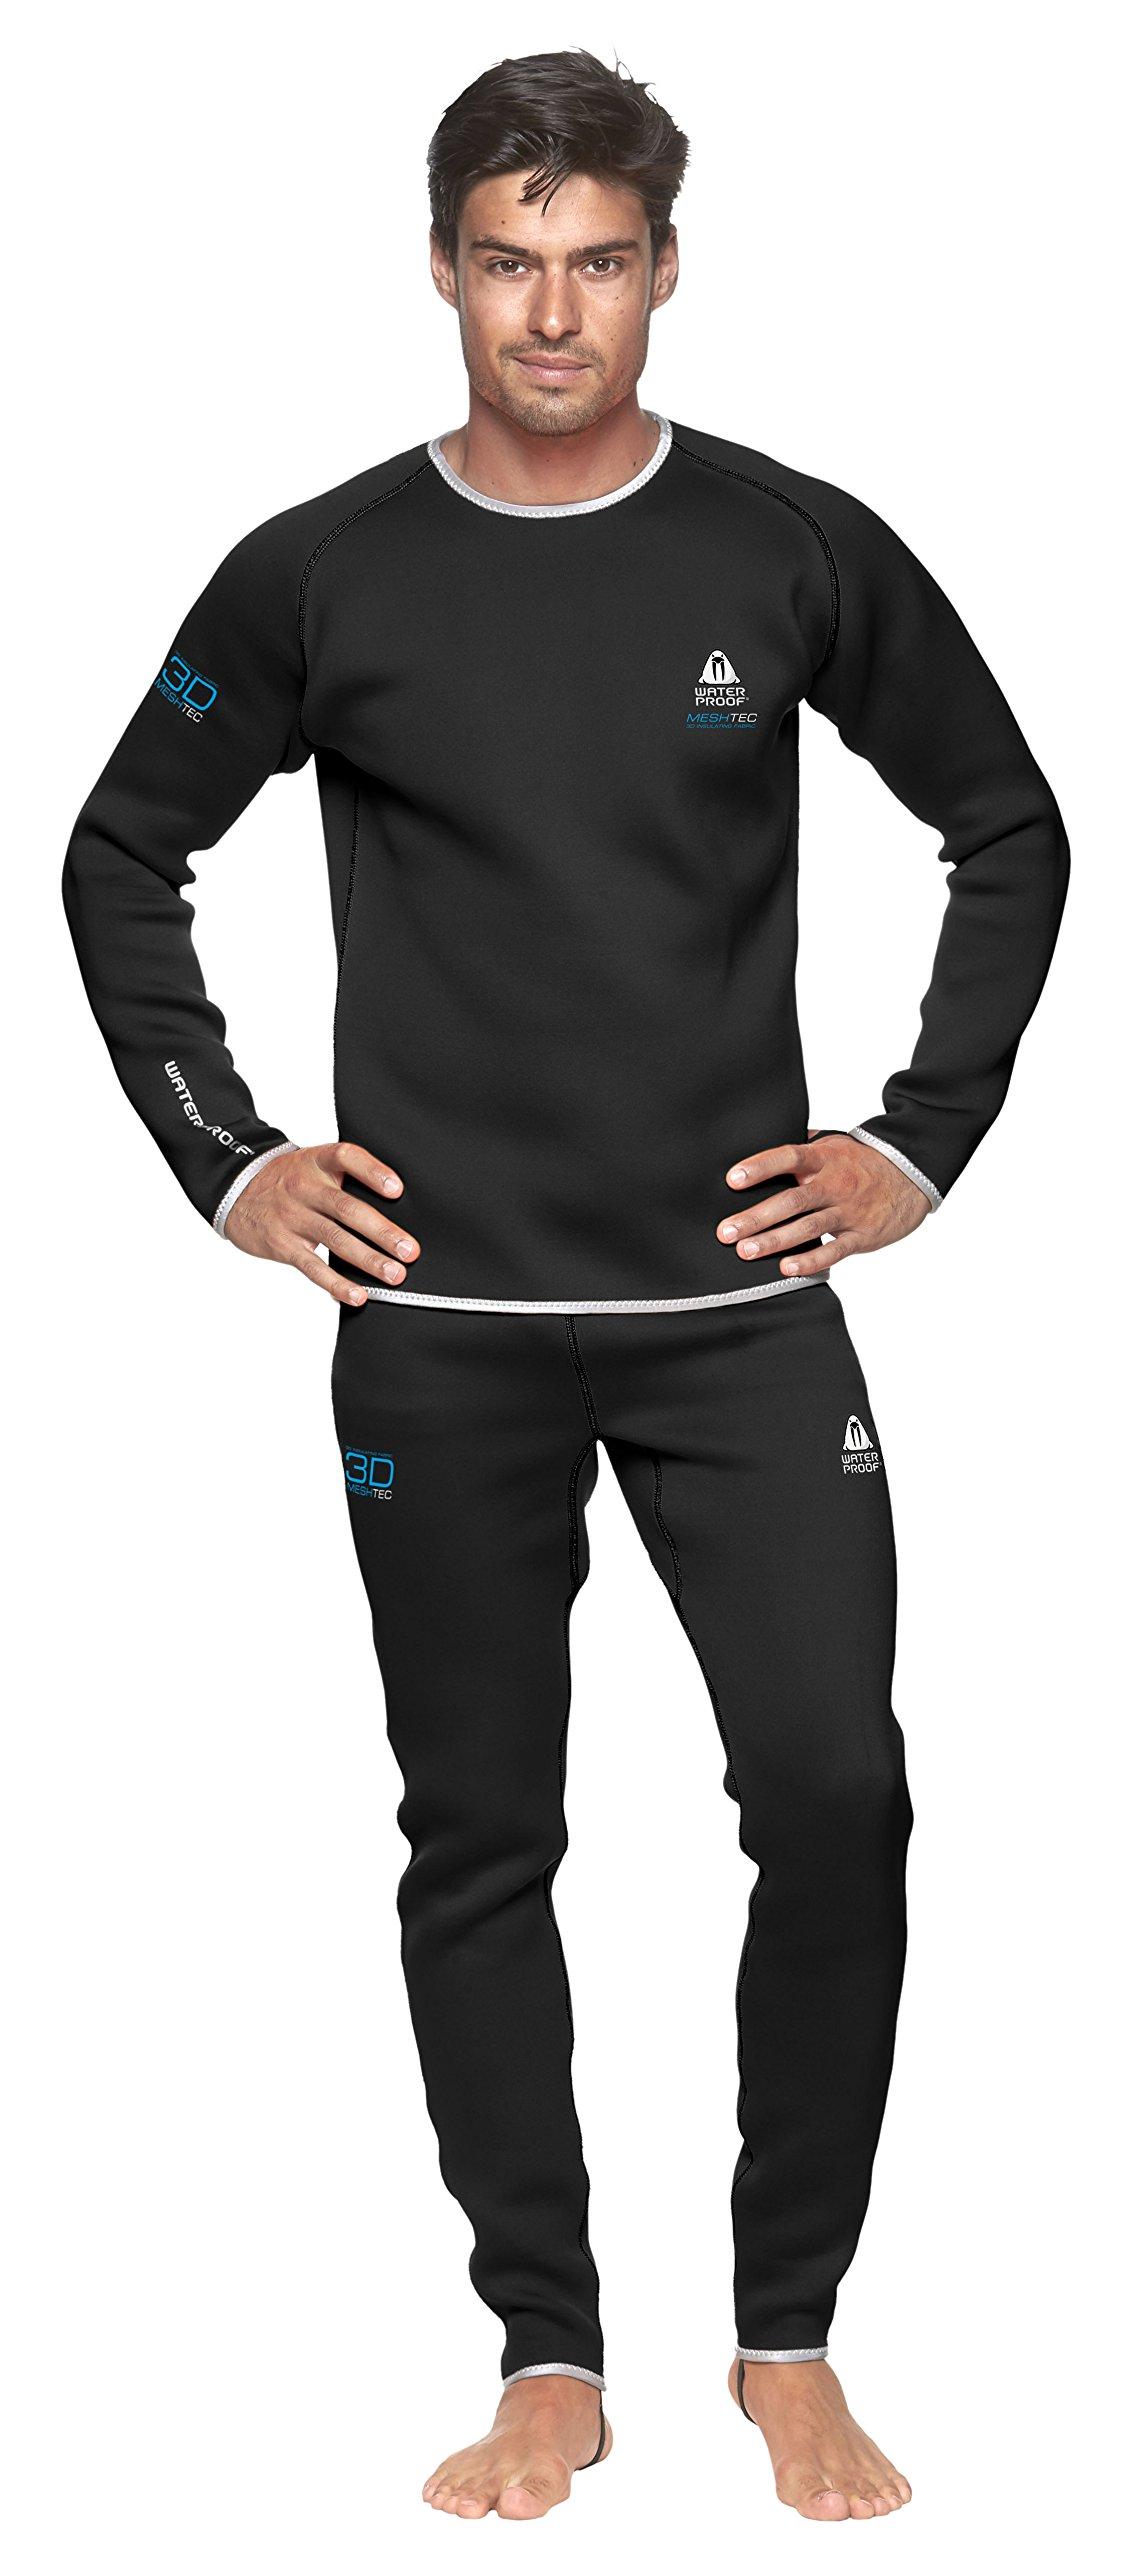 486224 Meshtec 3D Shirt Female, Medium Large Size by Waterproof